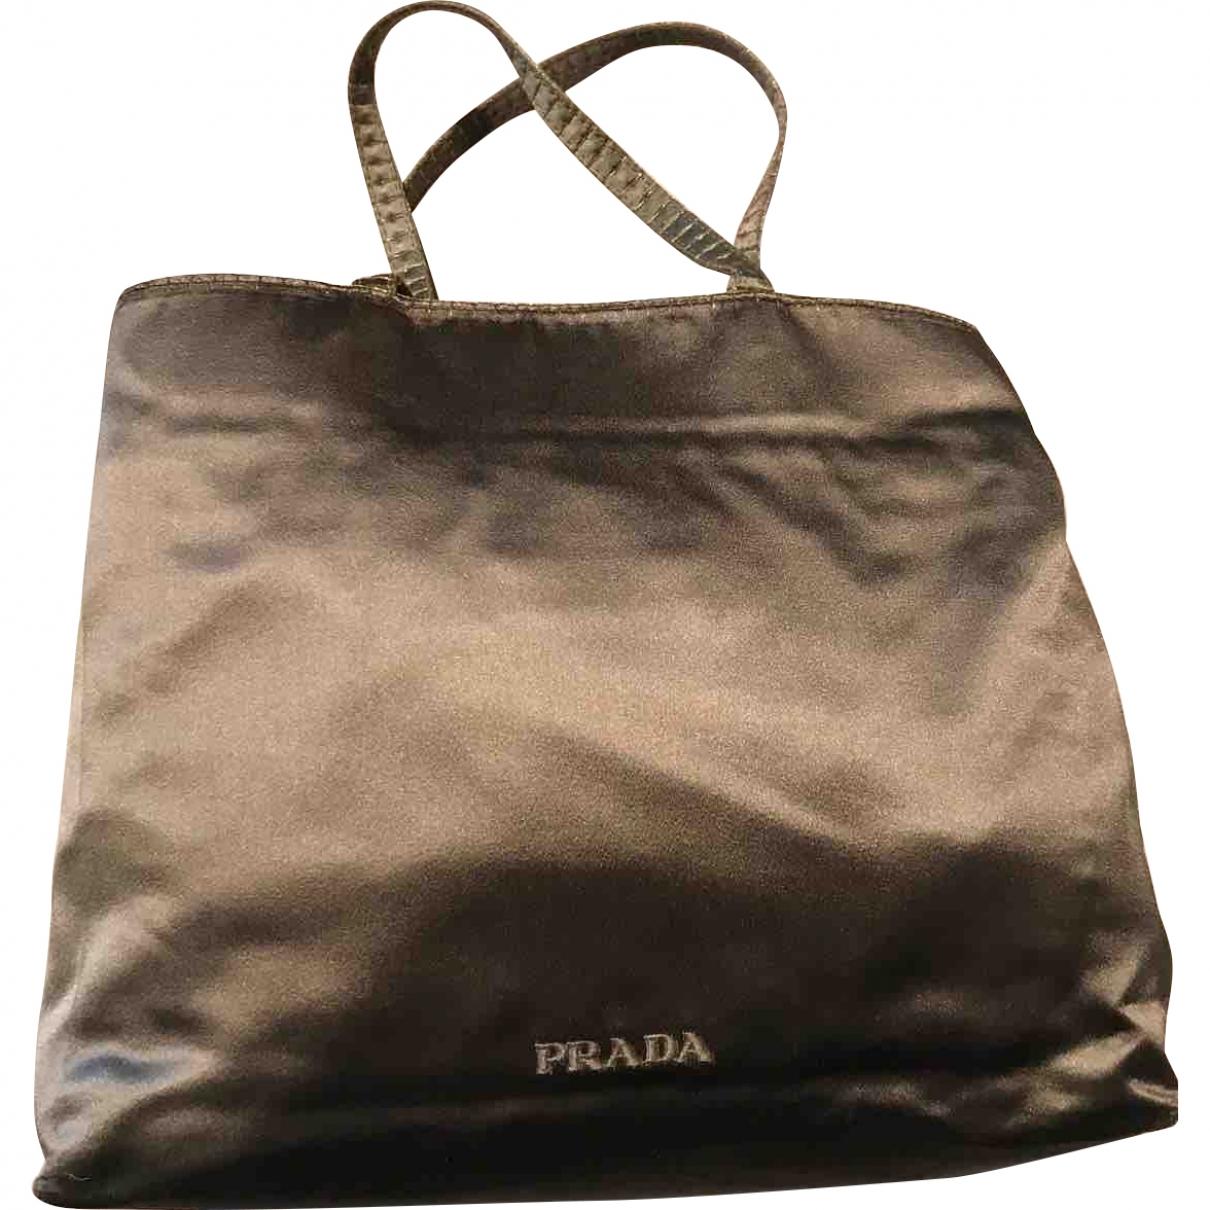 Prada \N Gold handbag for Women \N